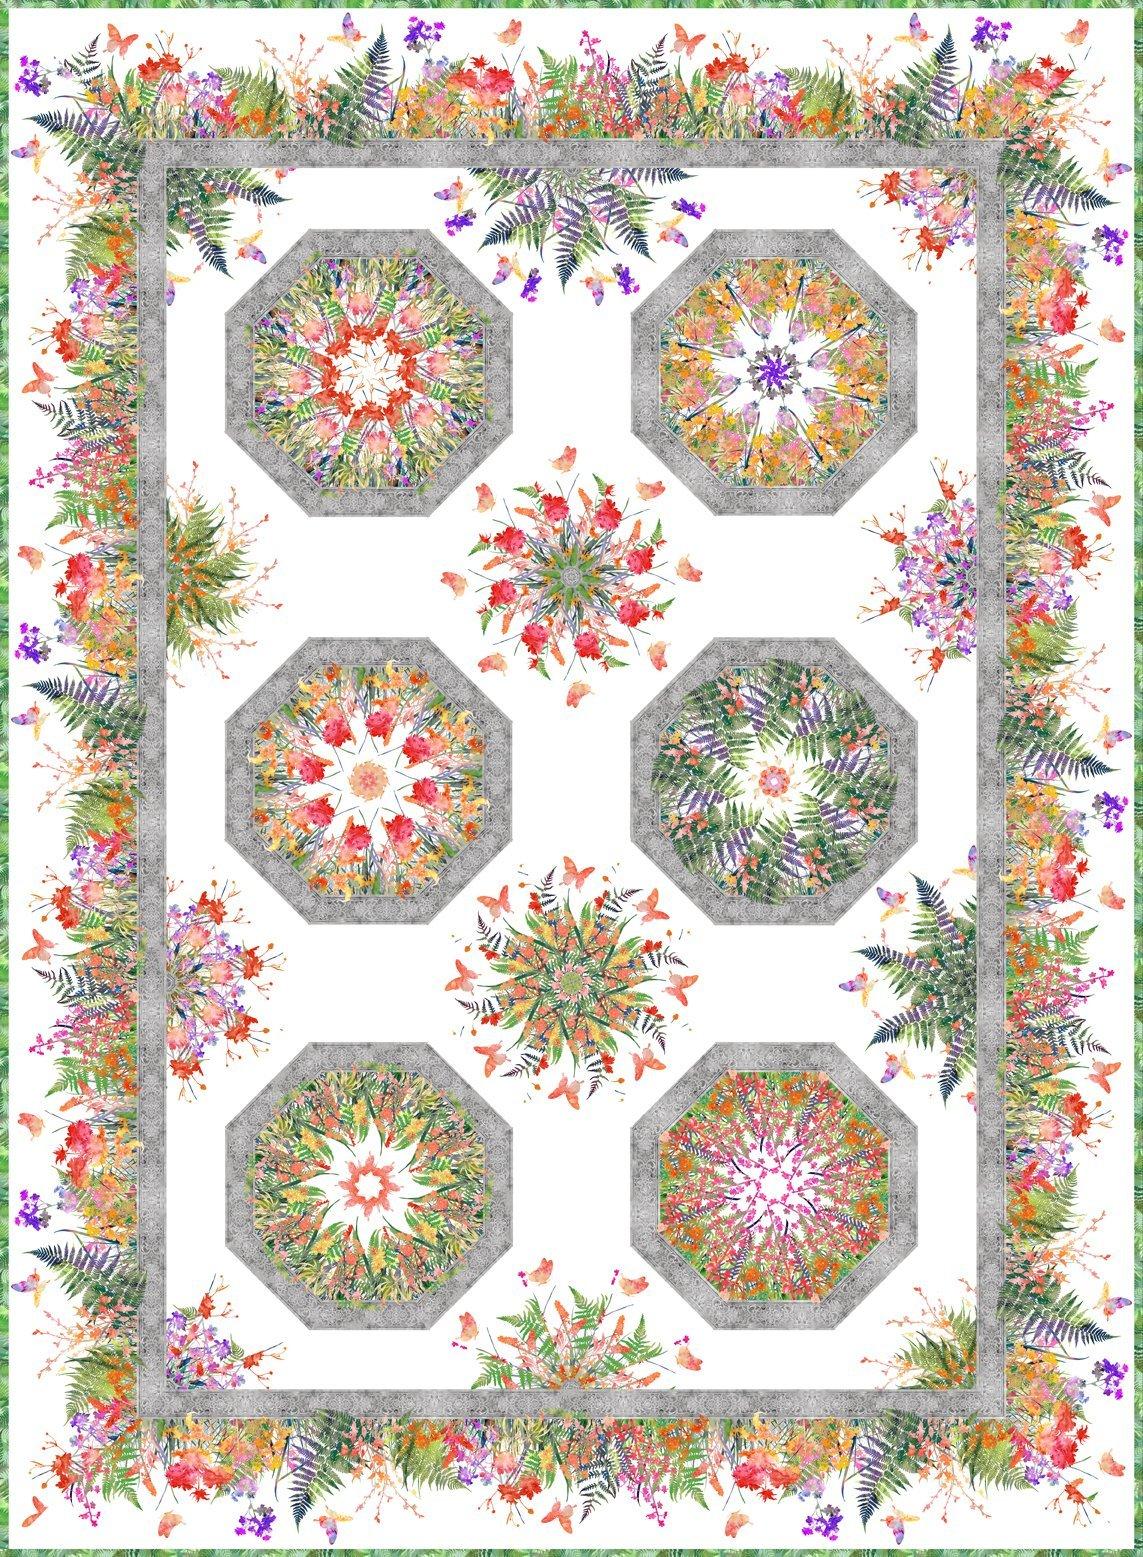 Garden of Dreams Kaleidoscope Quilt Pattern (64x86.5)